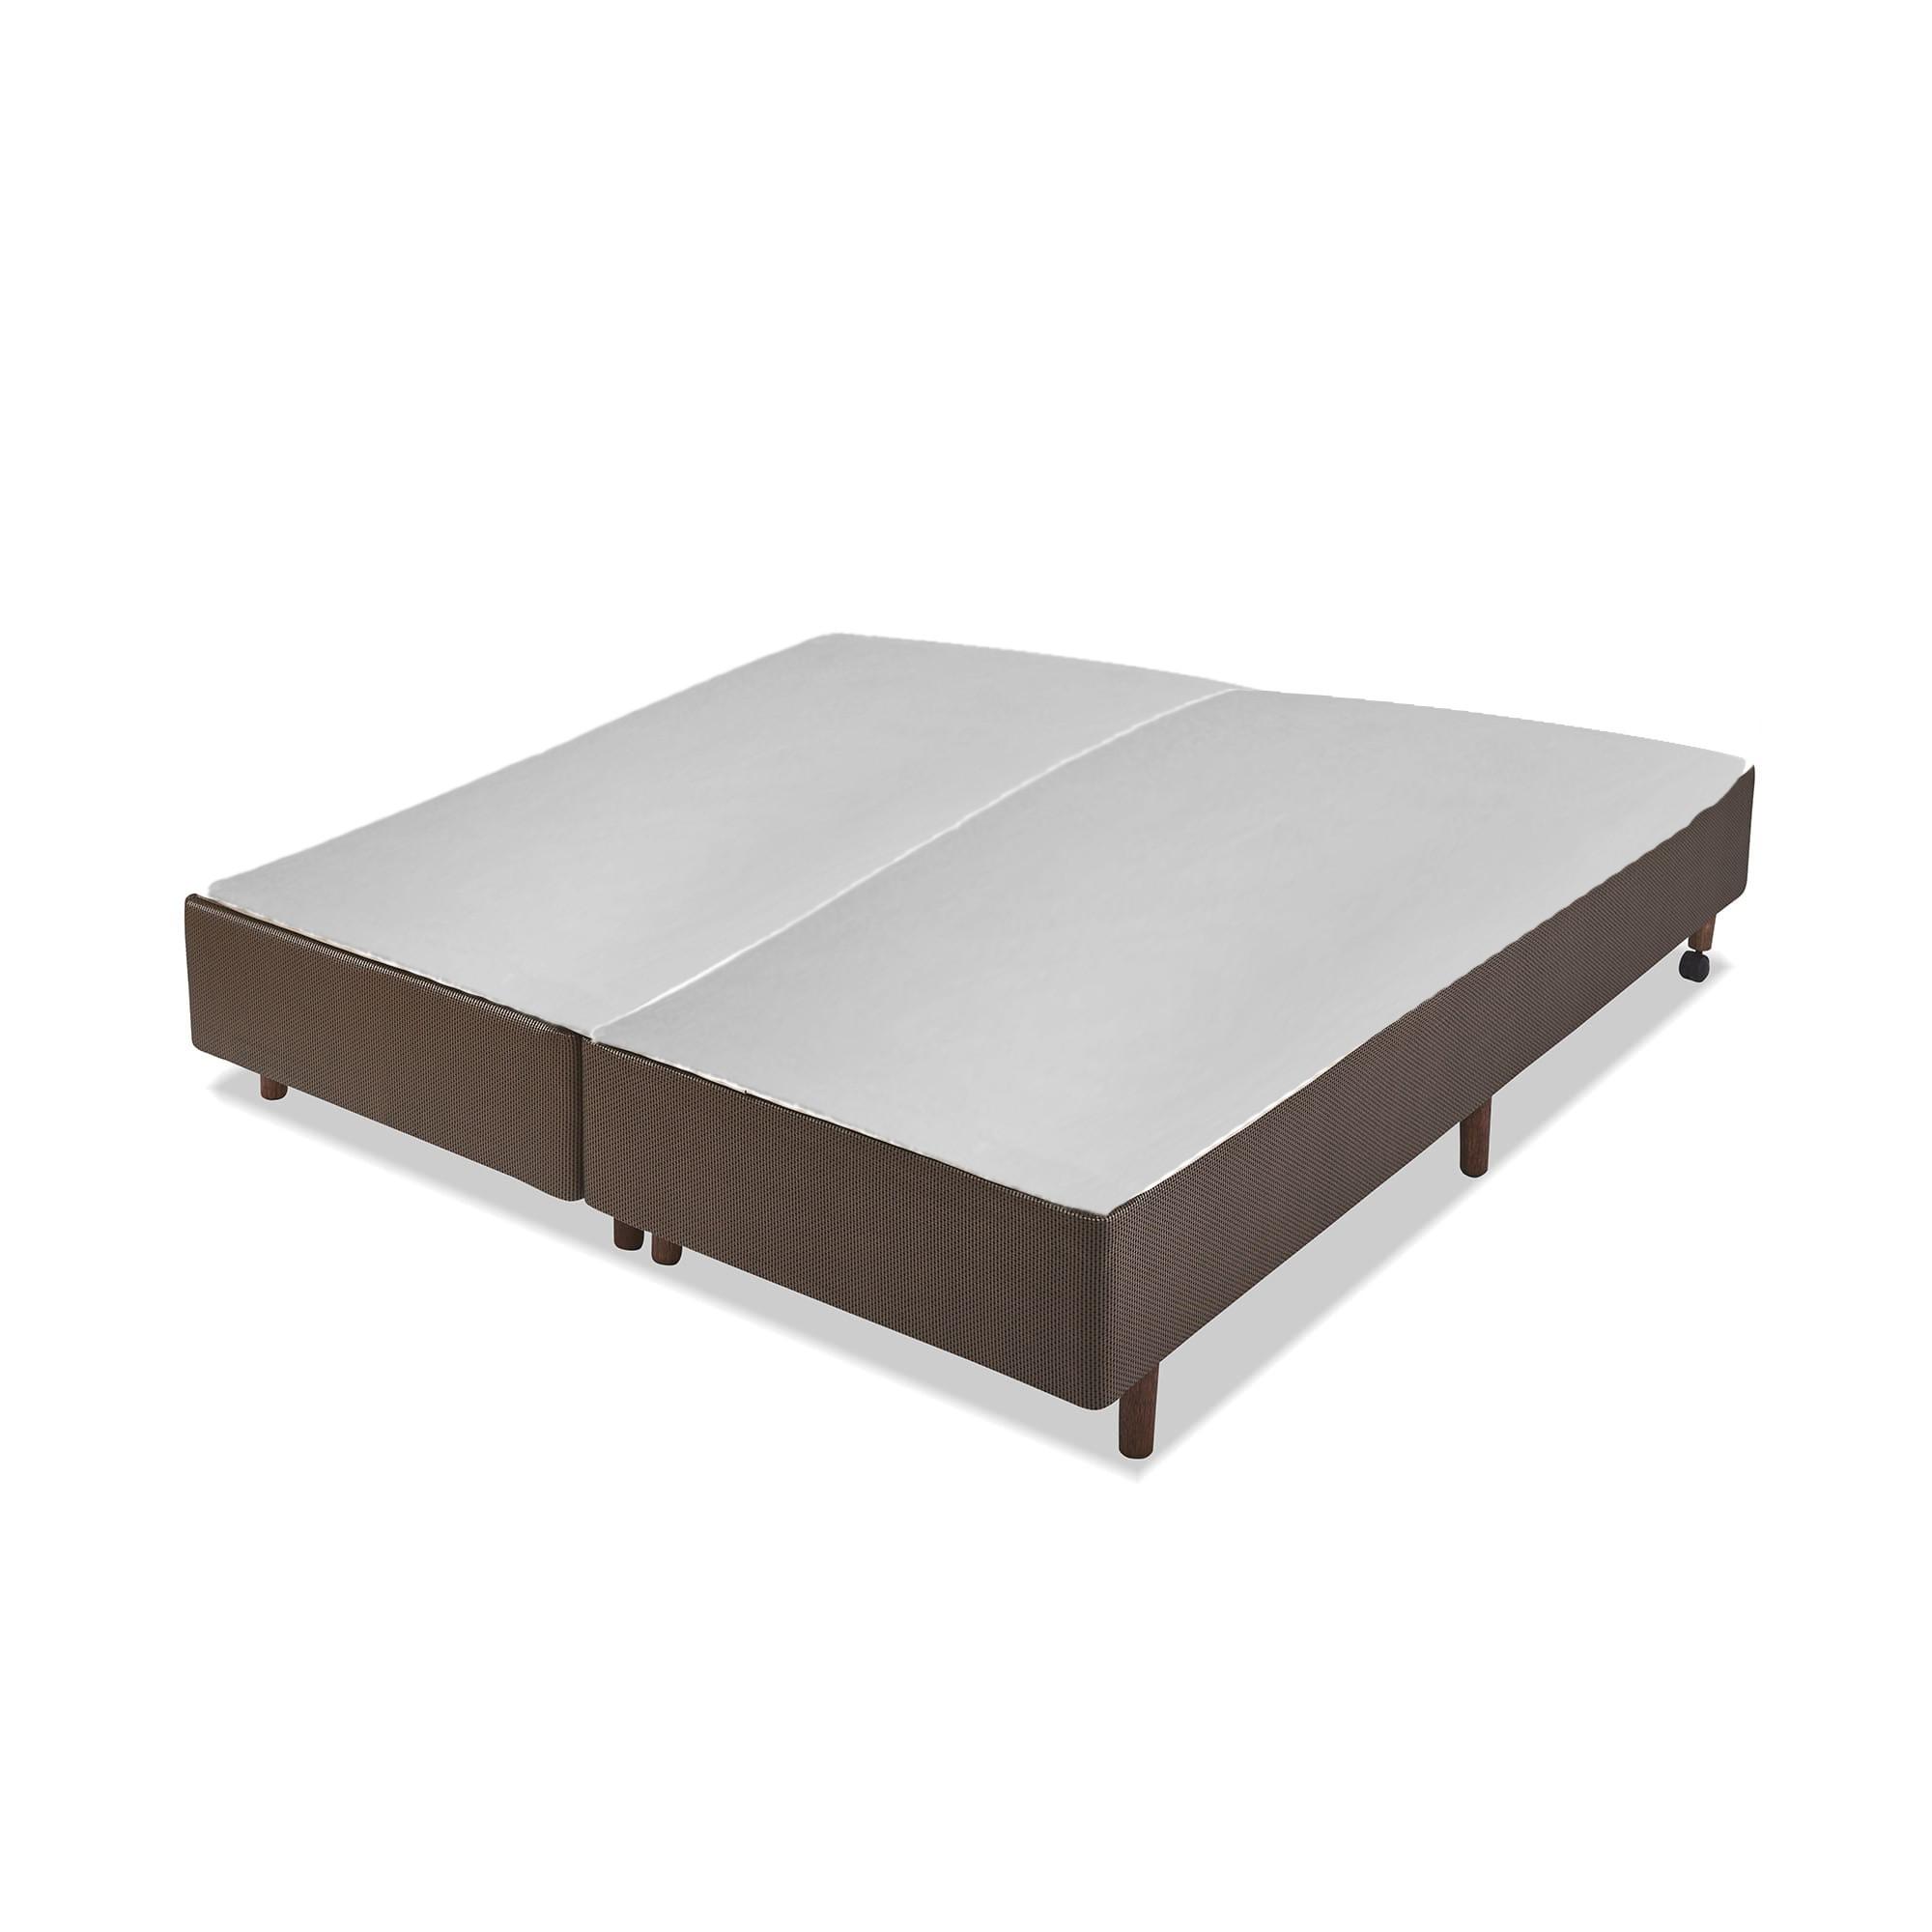 Box F.A. Colchões Prime Tech Marrom 25 cm [King 193 x 203 cm]